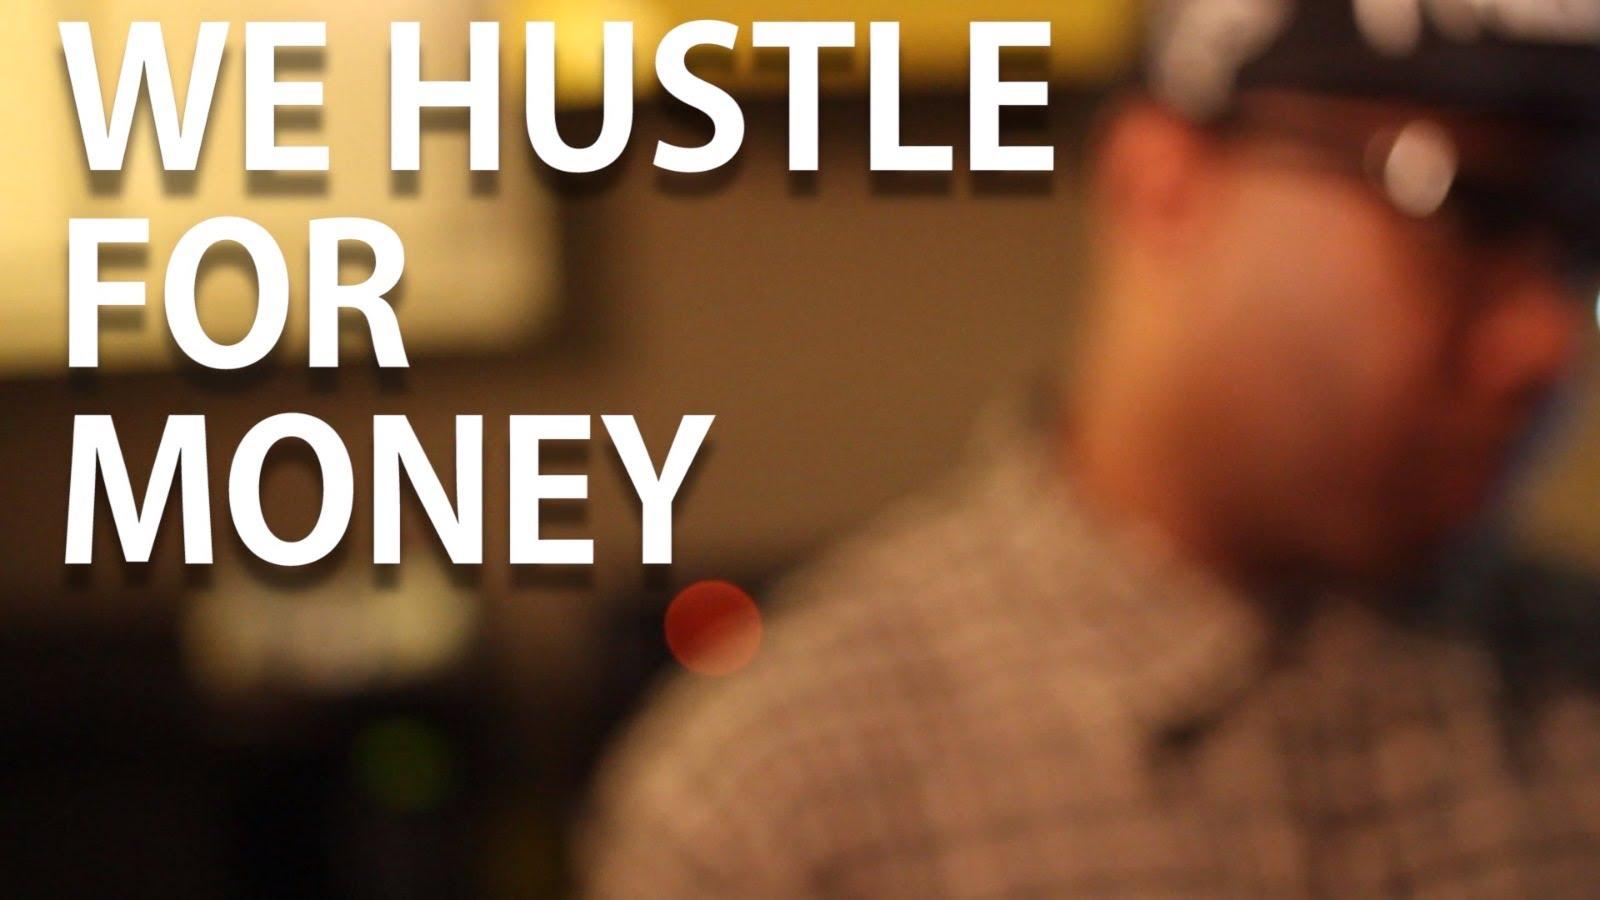 Marc Decoca – We Hustle for Money